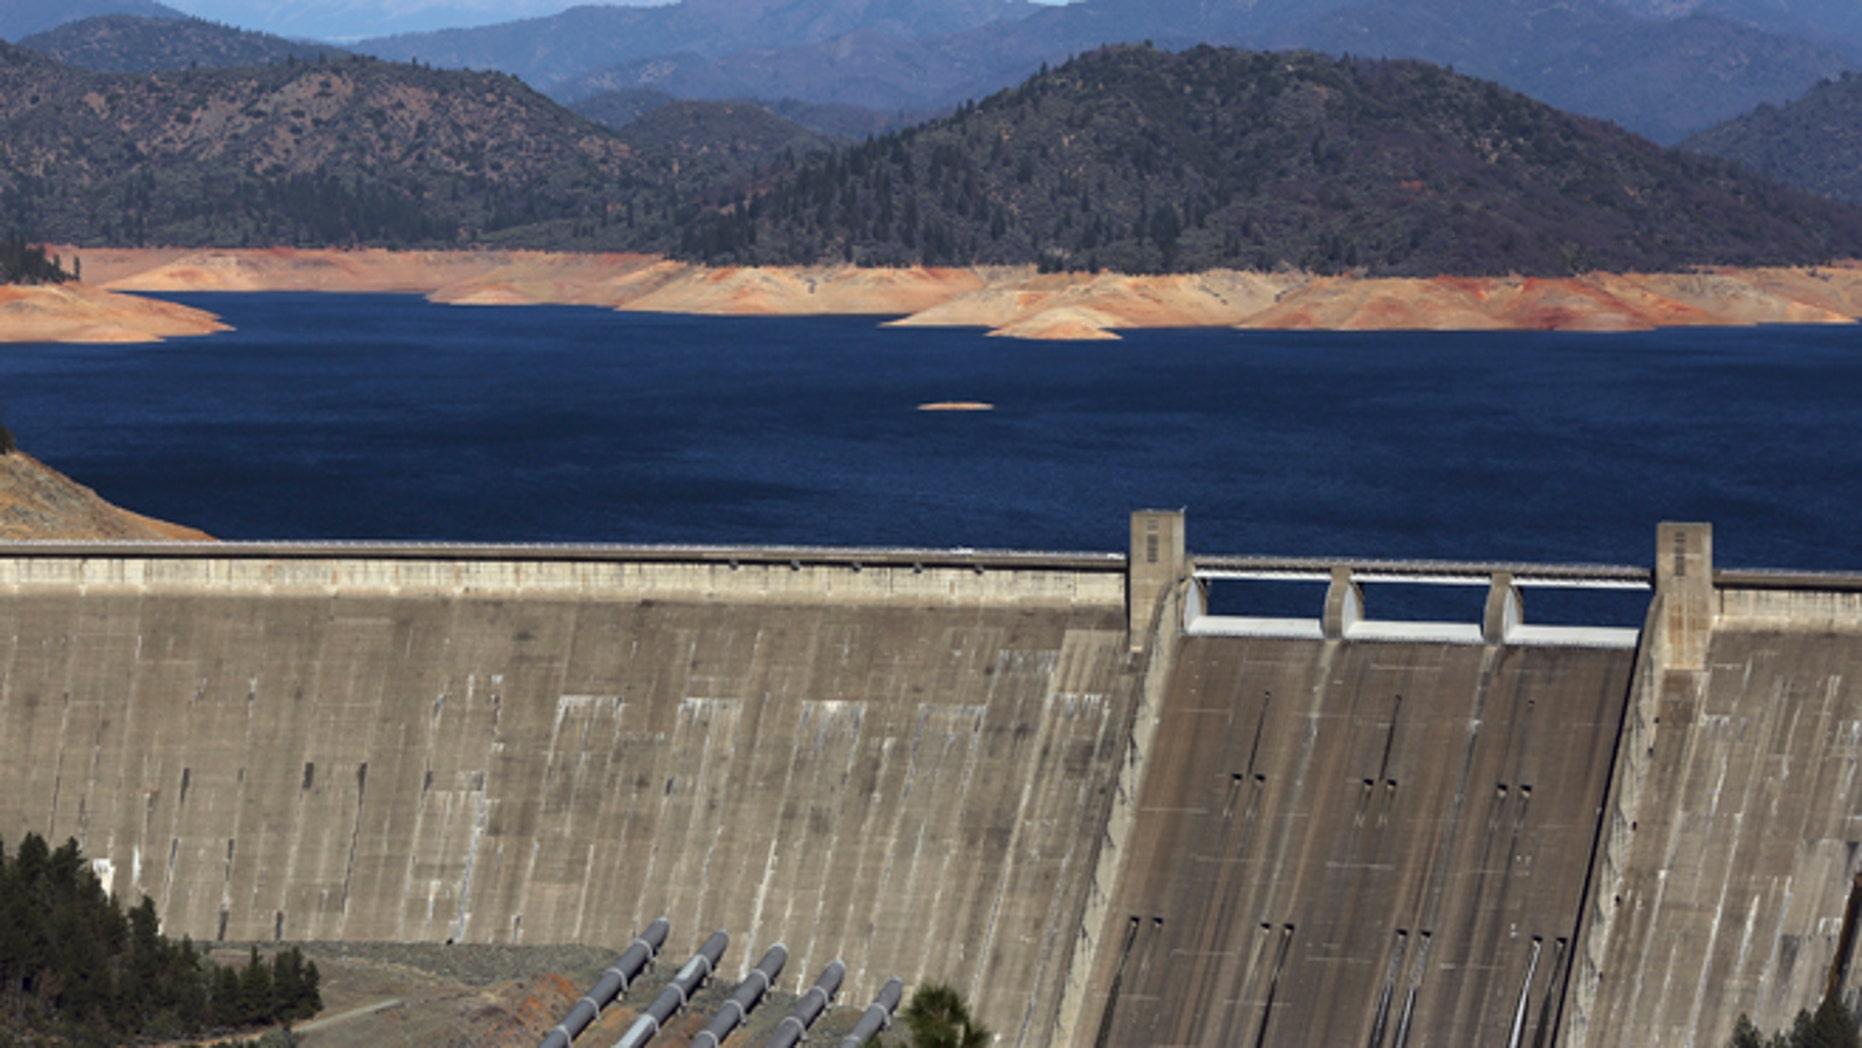 This Jan. 23, 2014 file photo shows Shasta Dam in Shasta, Calif.